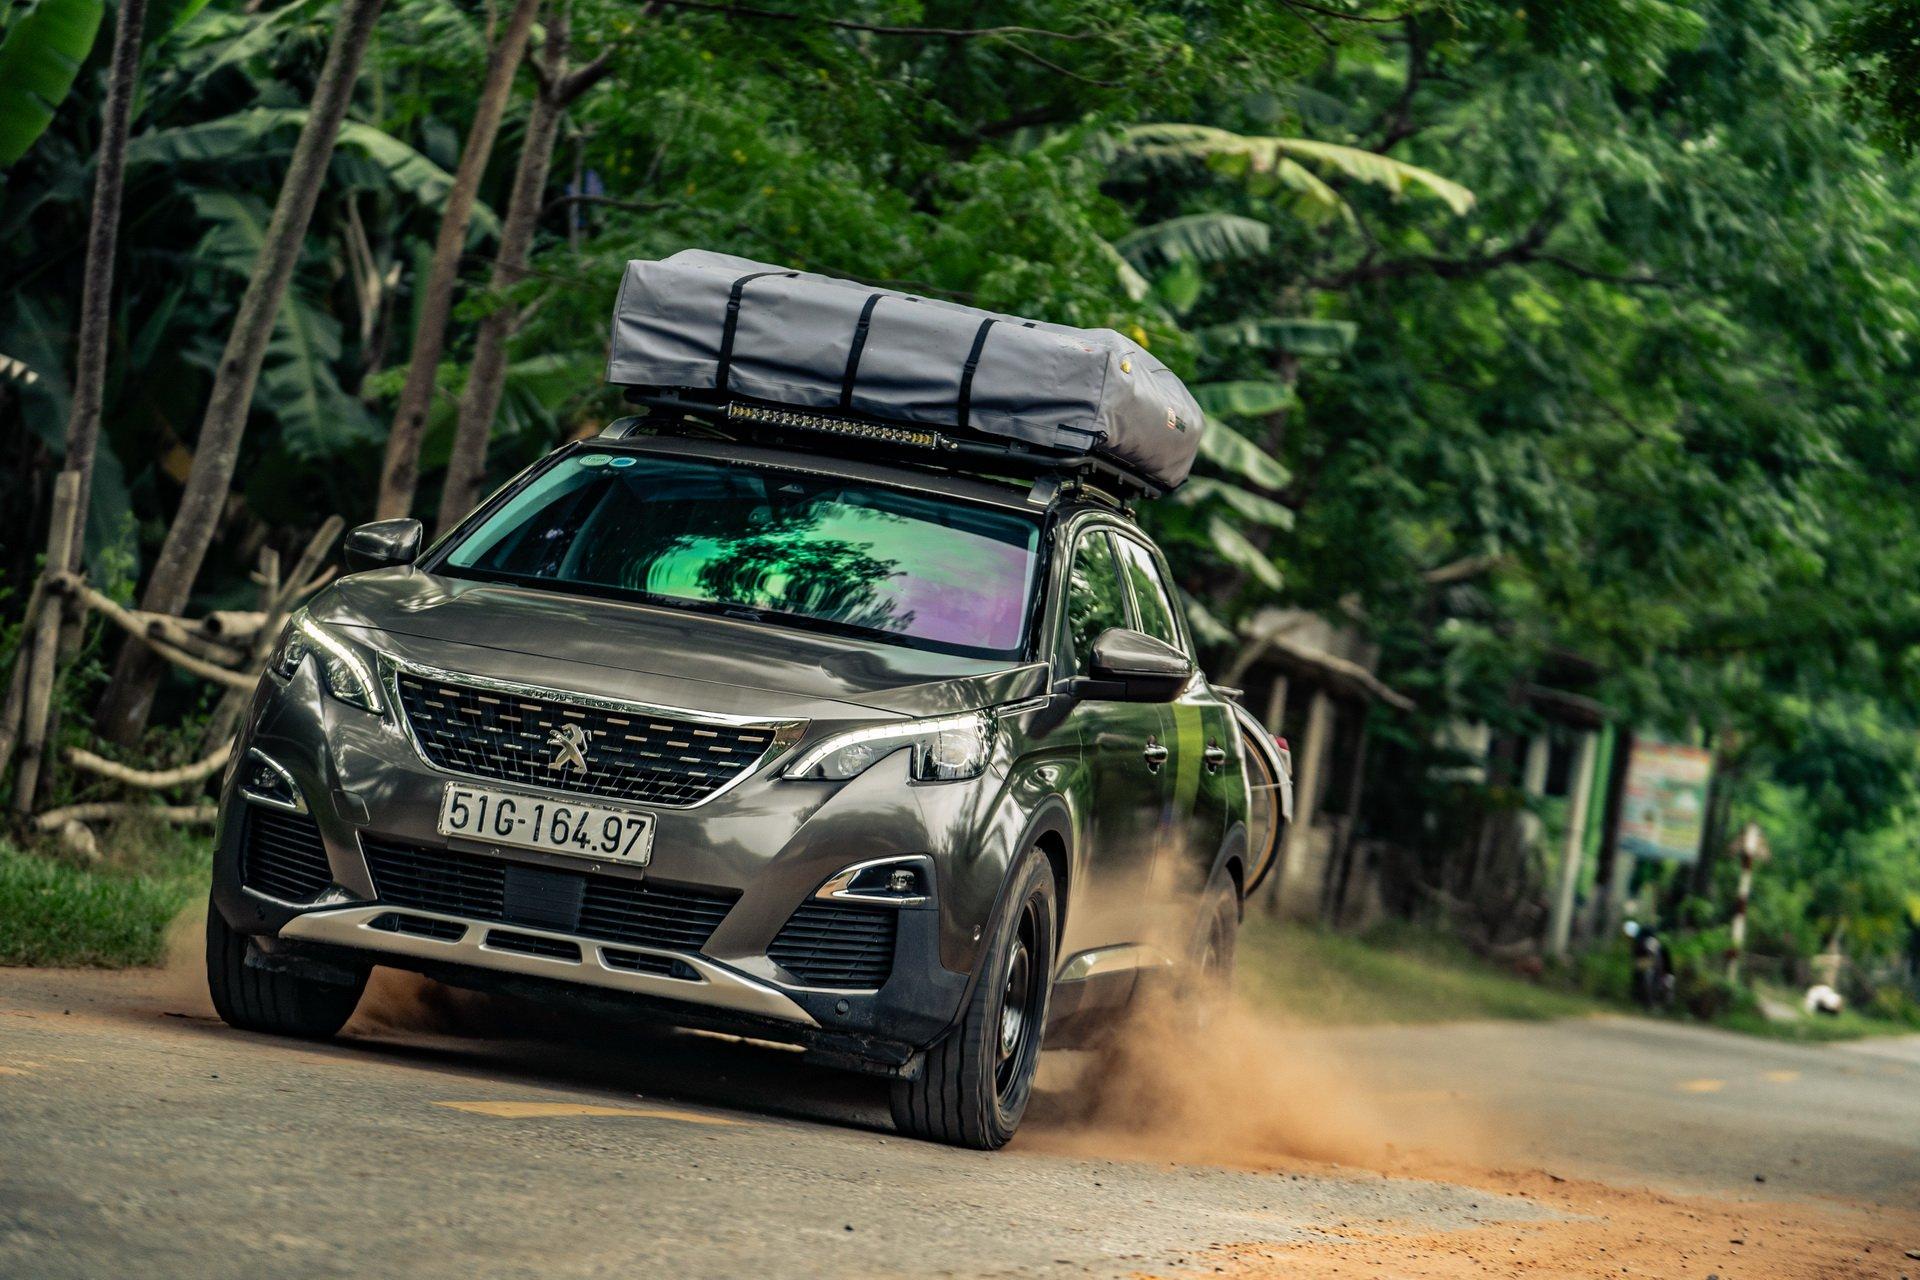 Peugeot-3008-Concept-Vietnam-Adventure-1